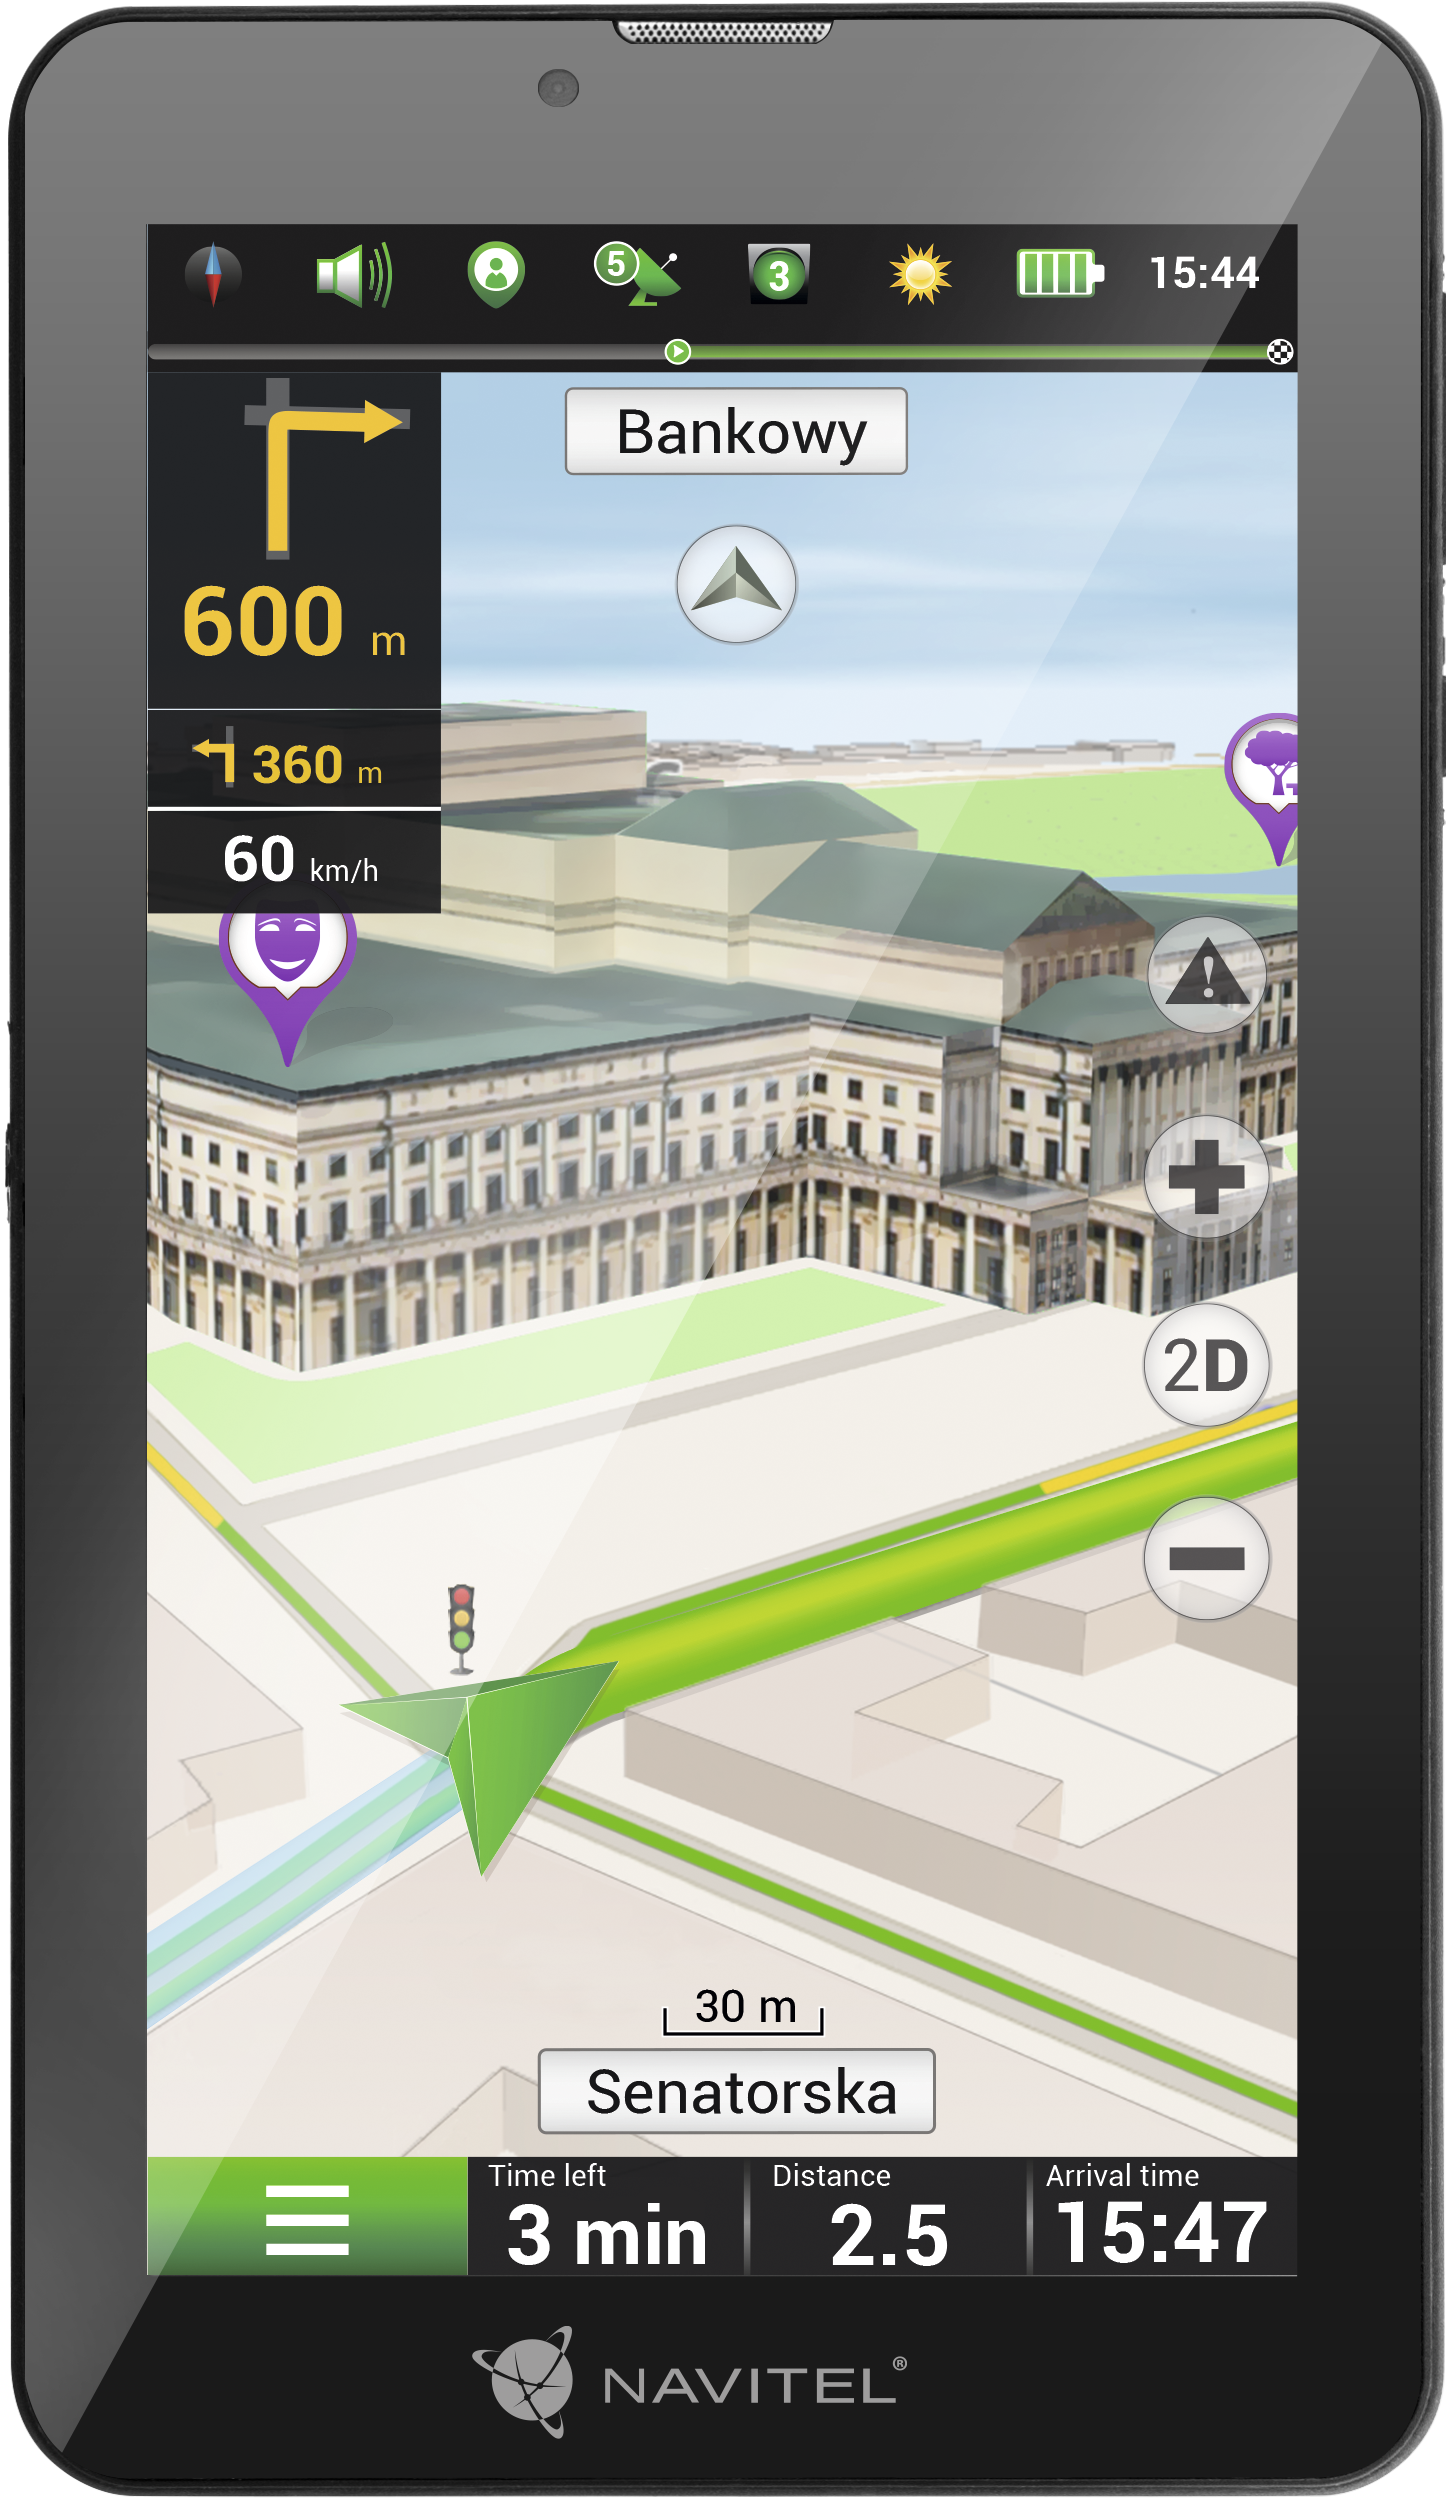 NAVT7003GP NAVITEL Bluetooth: Ja, Android 8.1 GO, 2G/3G Navigatiesysteem NAVT7003GP